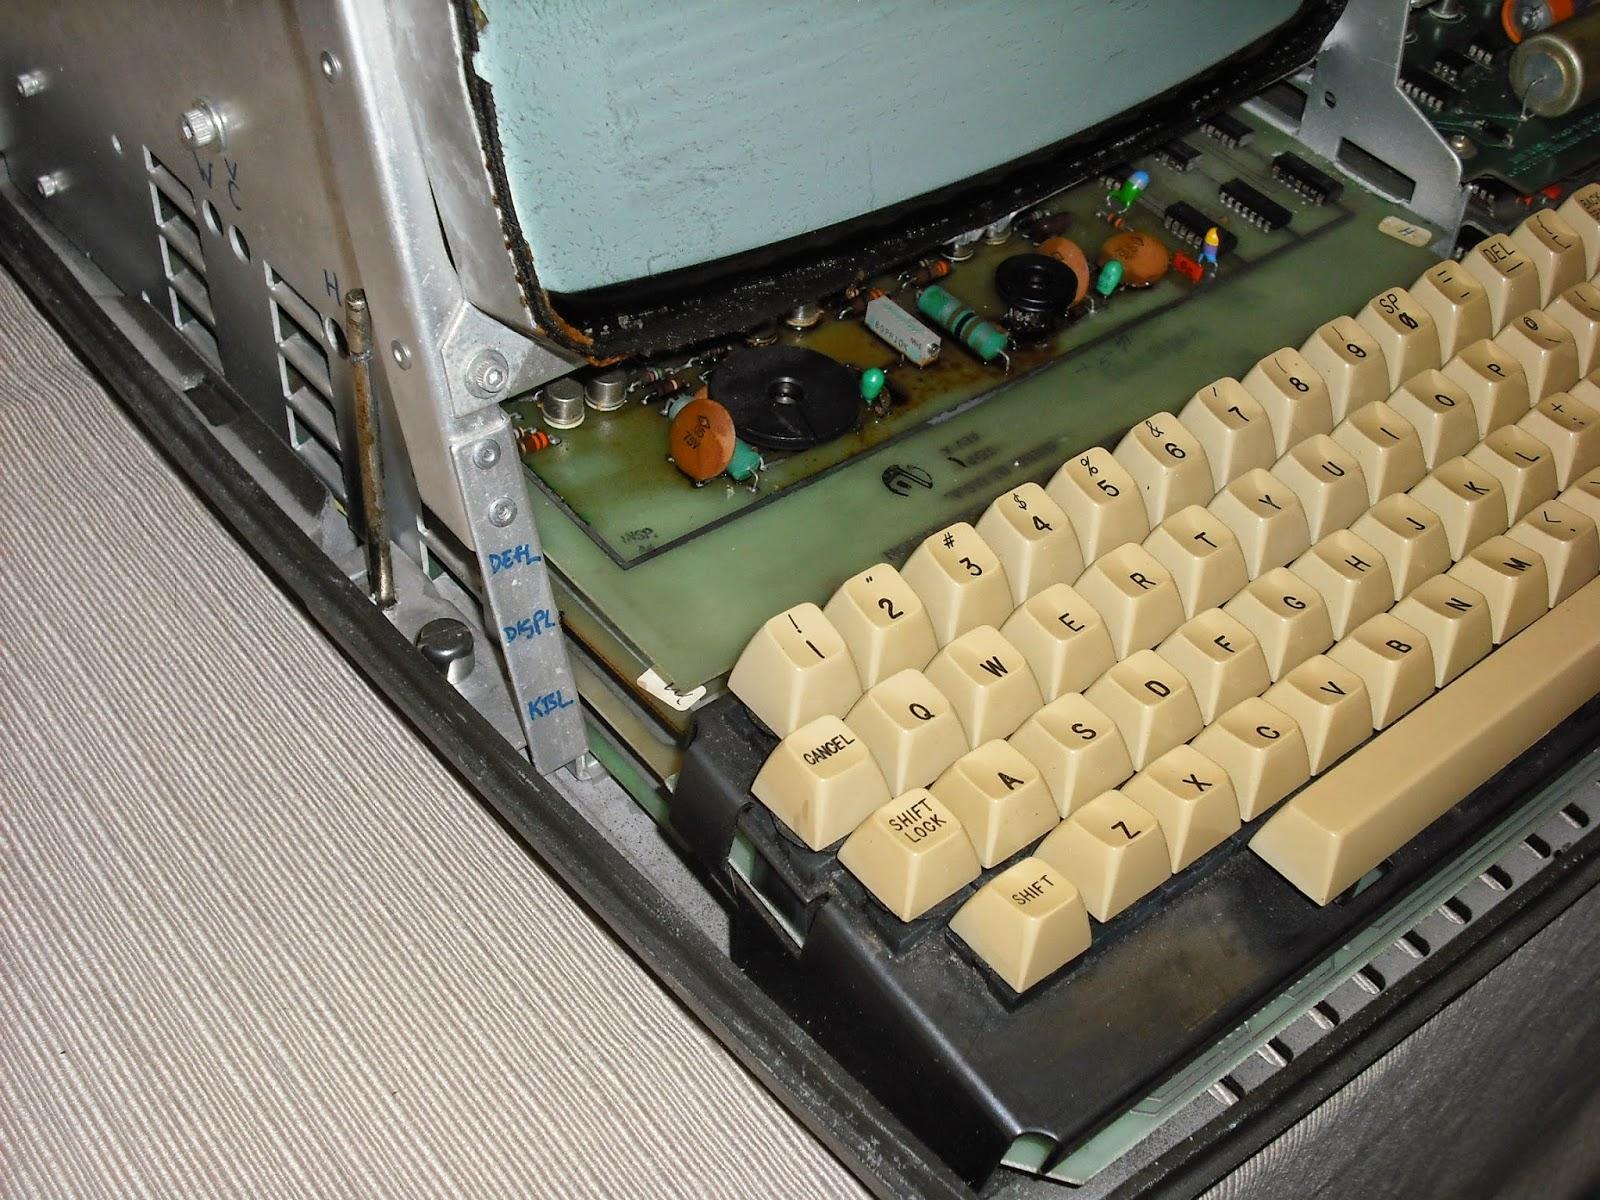 CTC2200 keyboard